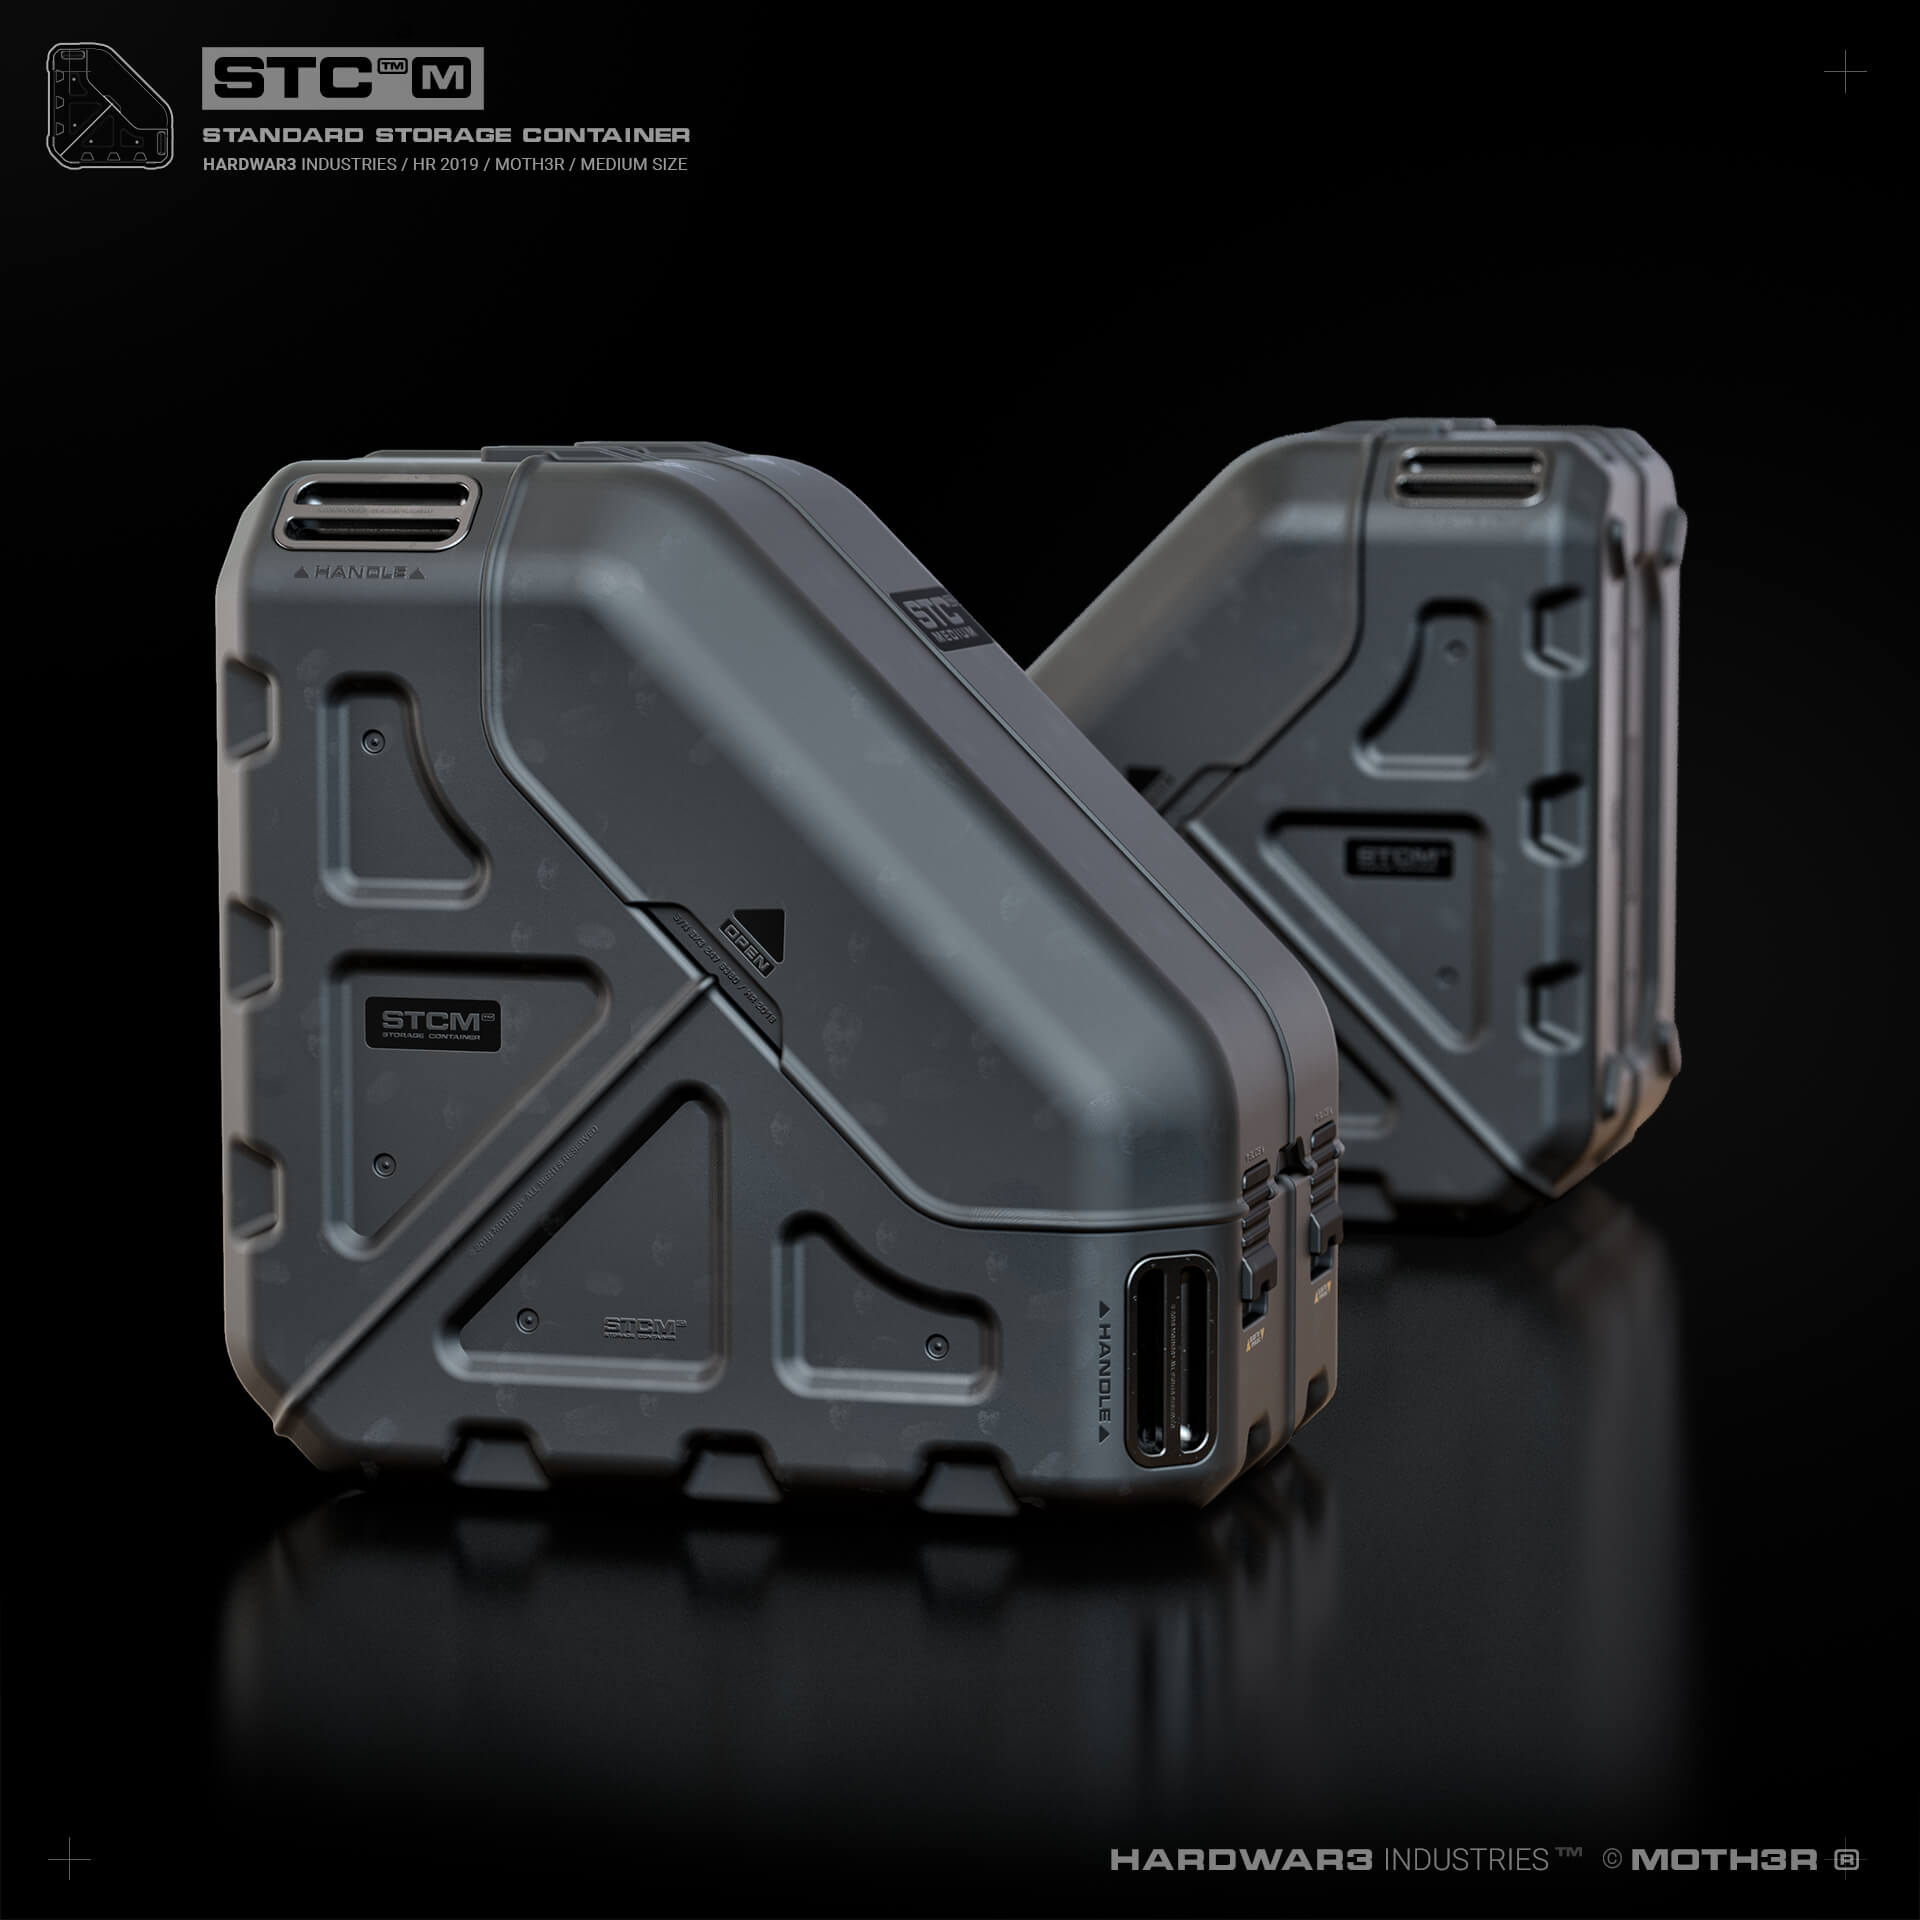 Box-a02.61